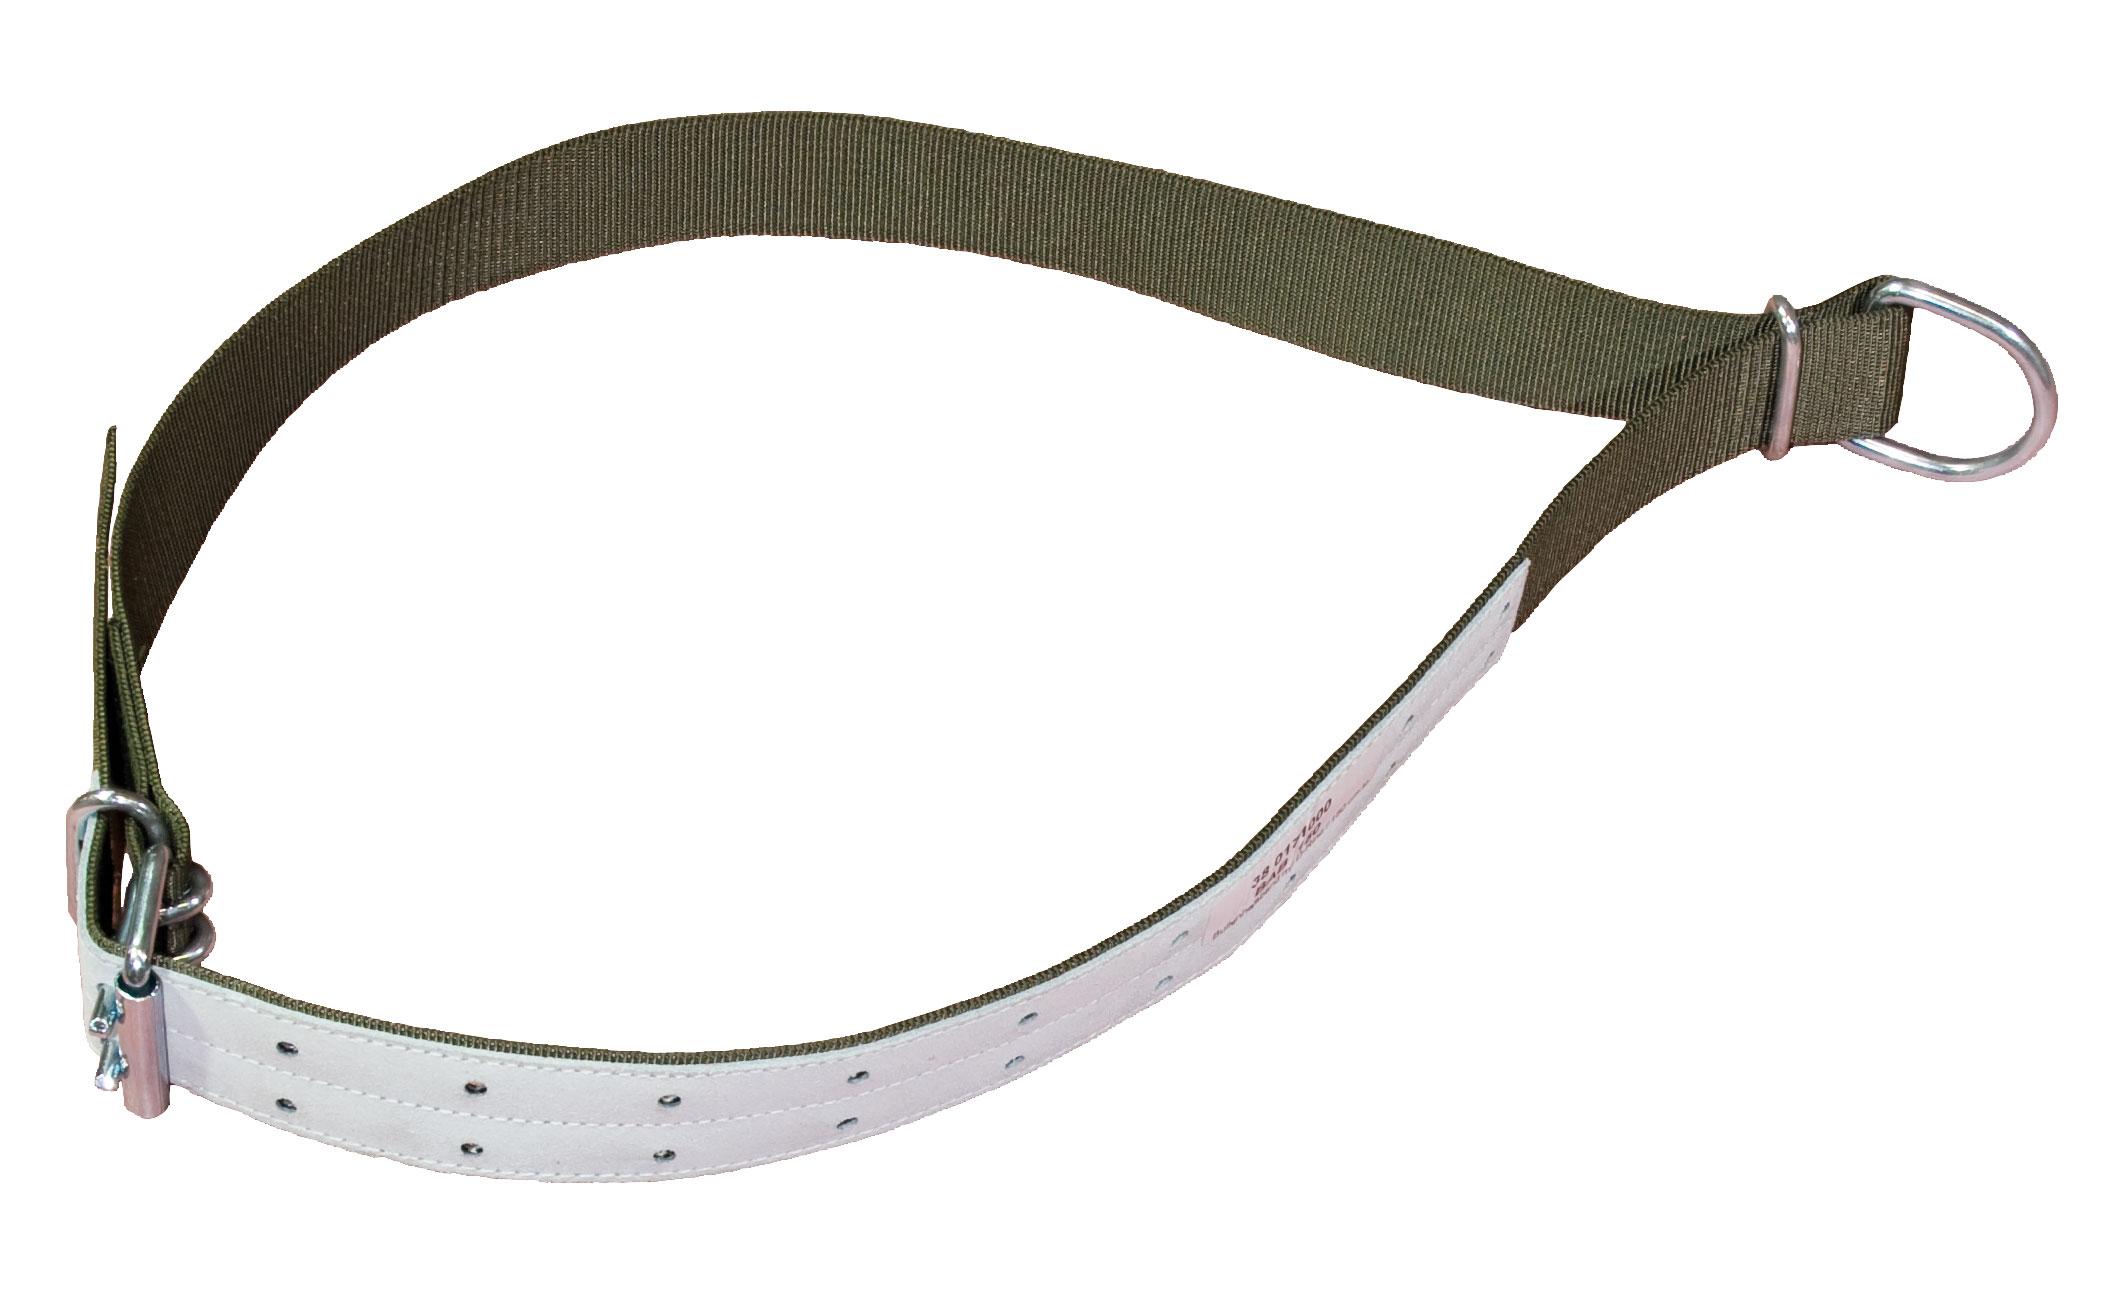 Bullenanbinder BAB 170